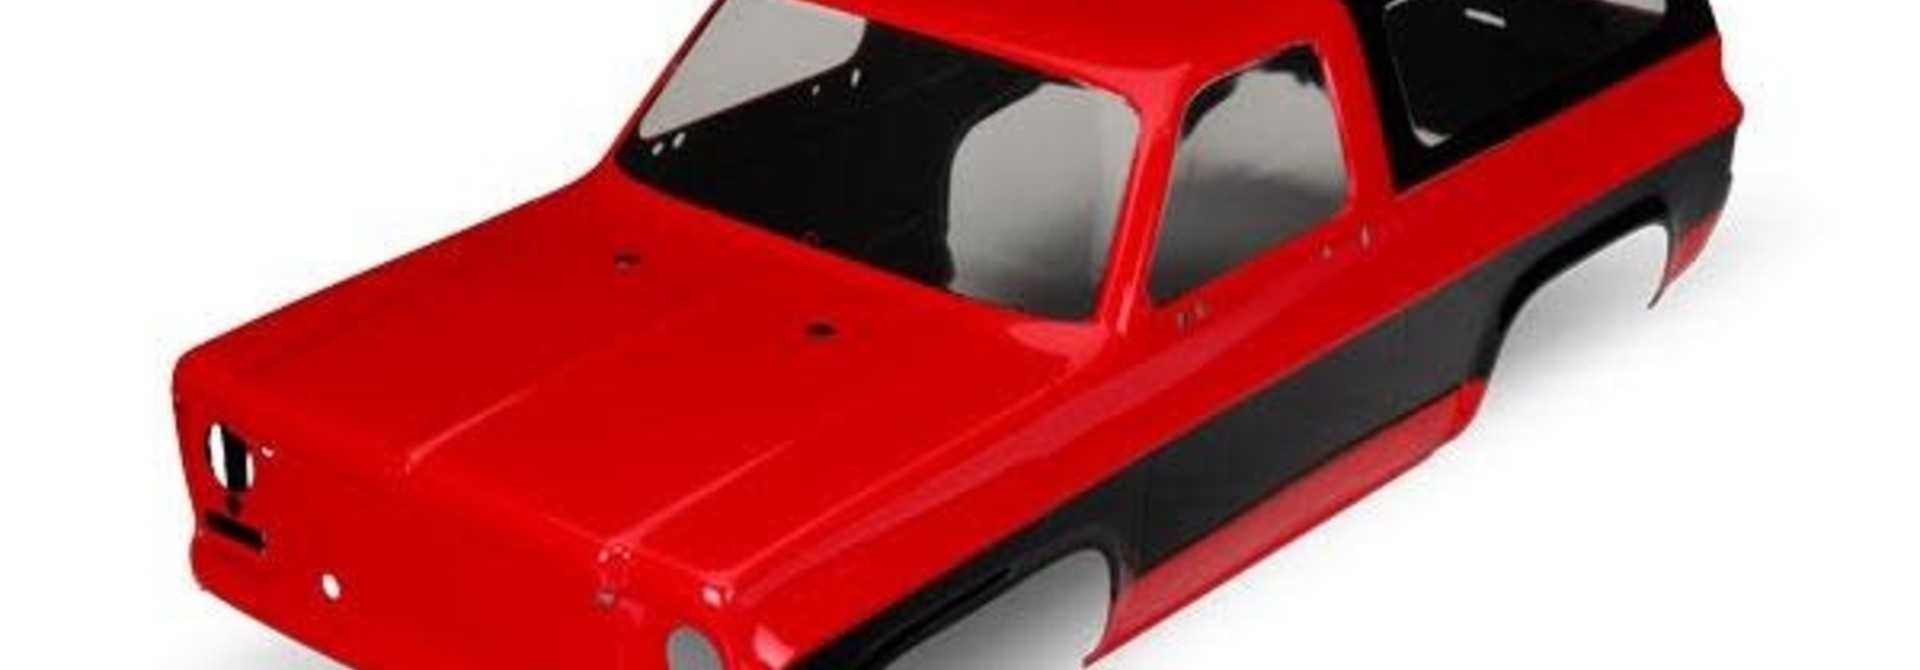 Body, Chevrolet Blazer (1979) (red) (requires grille, side mirrors, door handles, TRX8130A